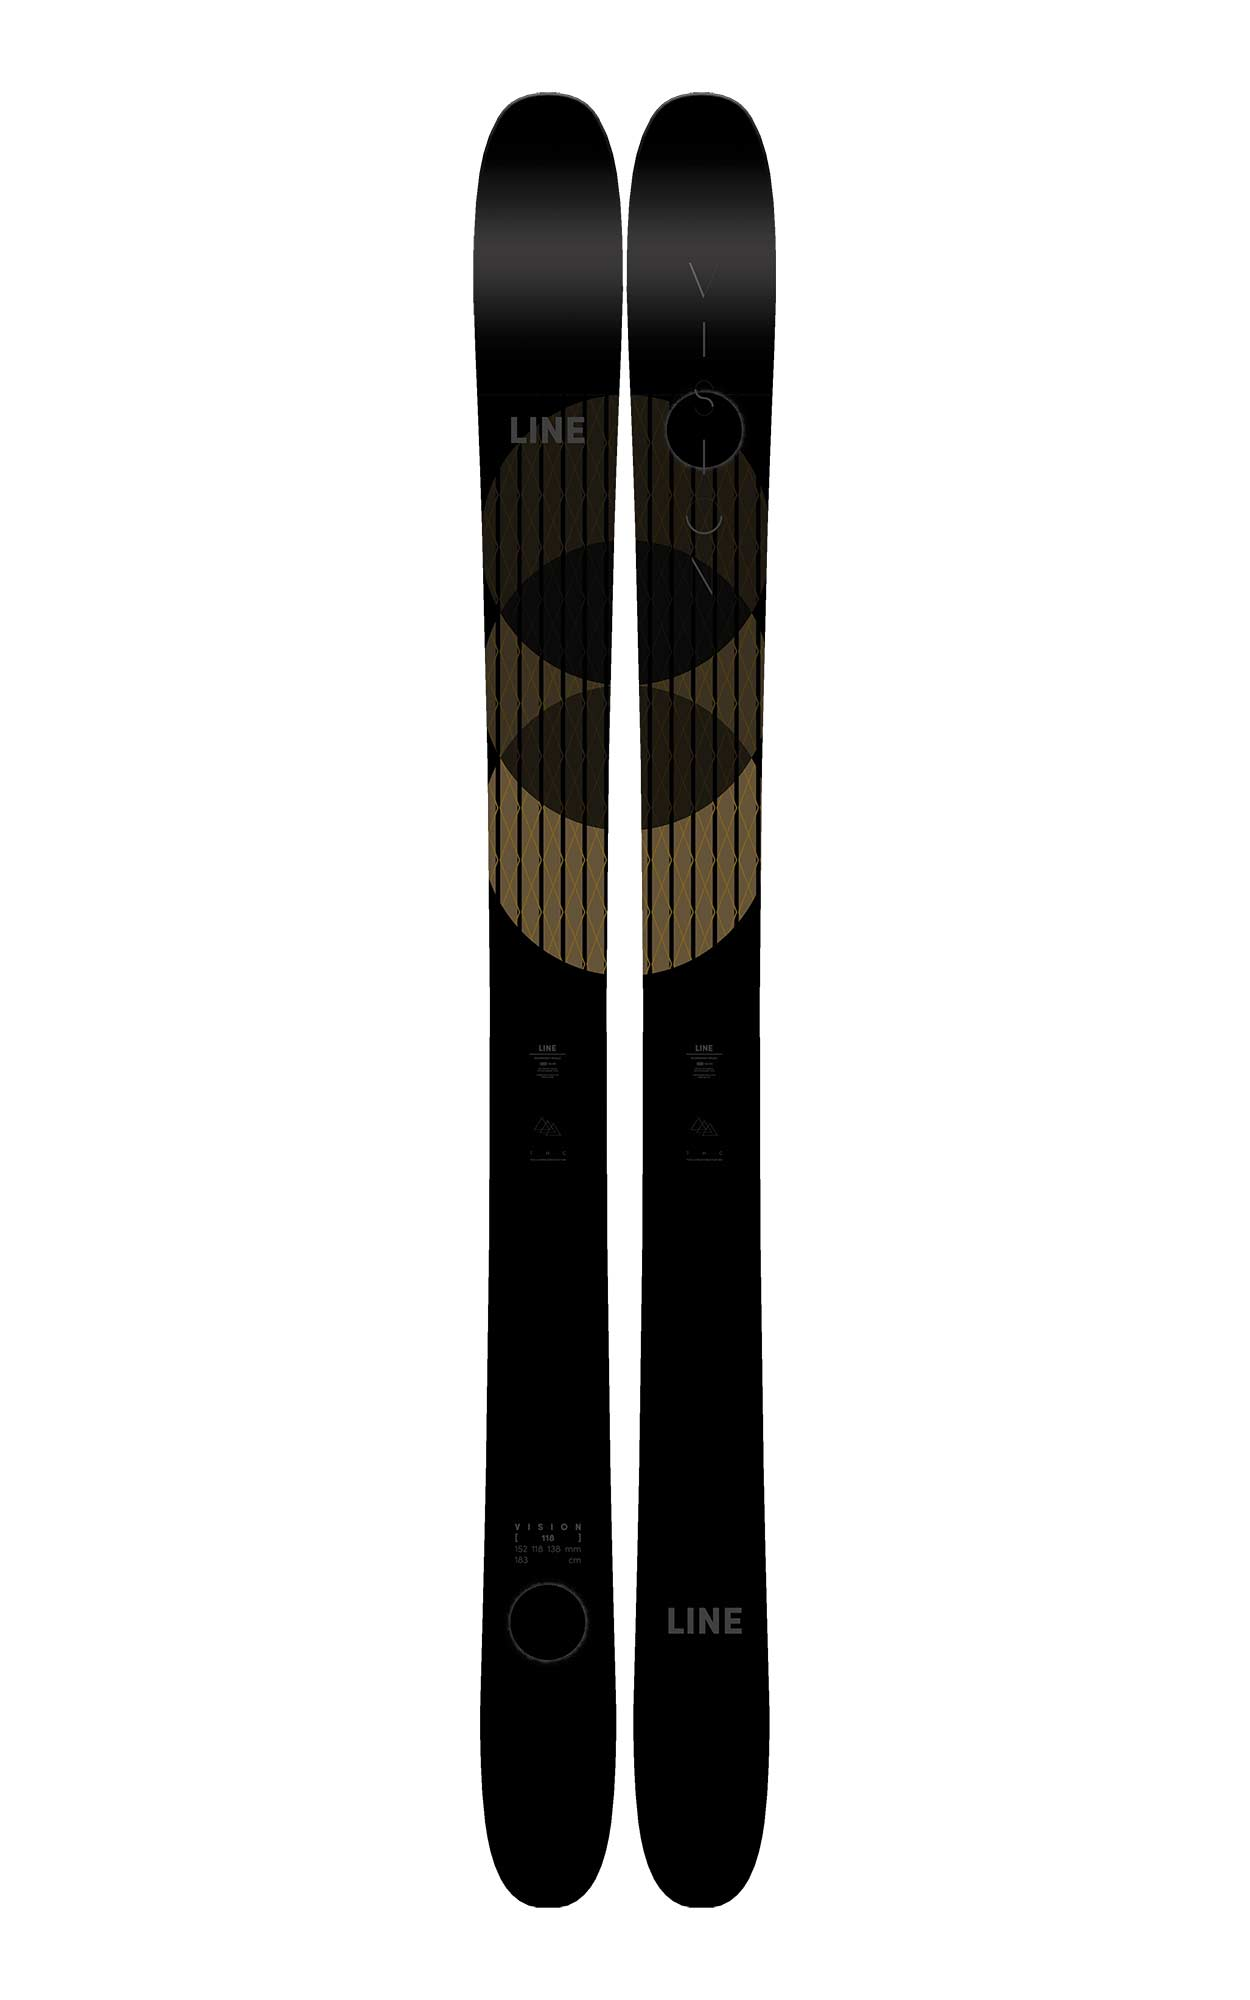 Line Skis – Vision 118 2022